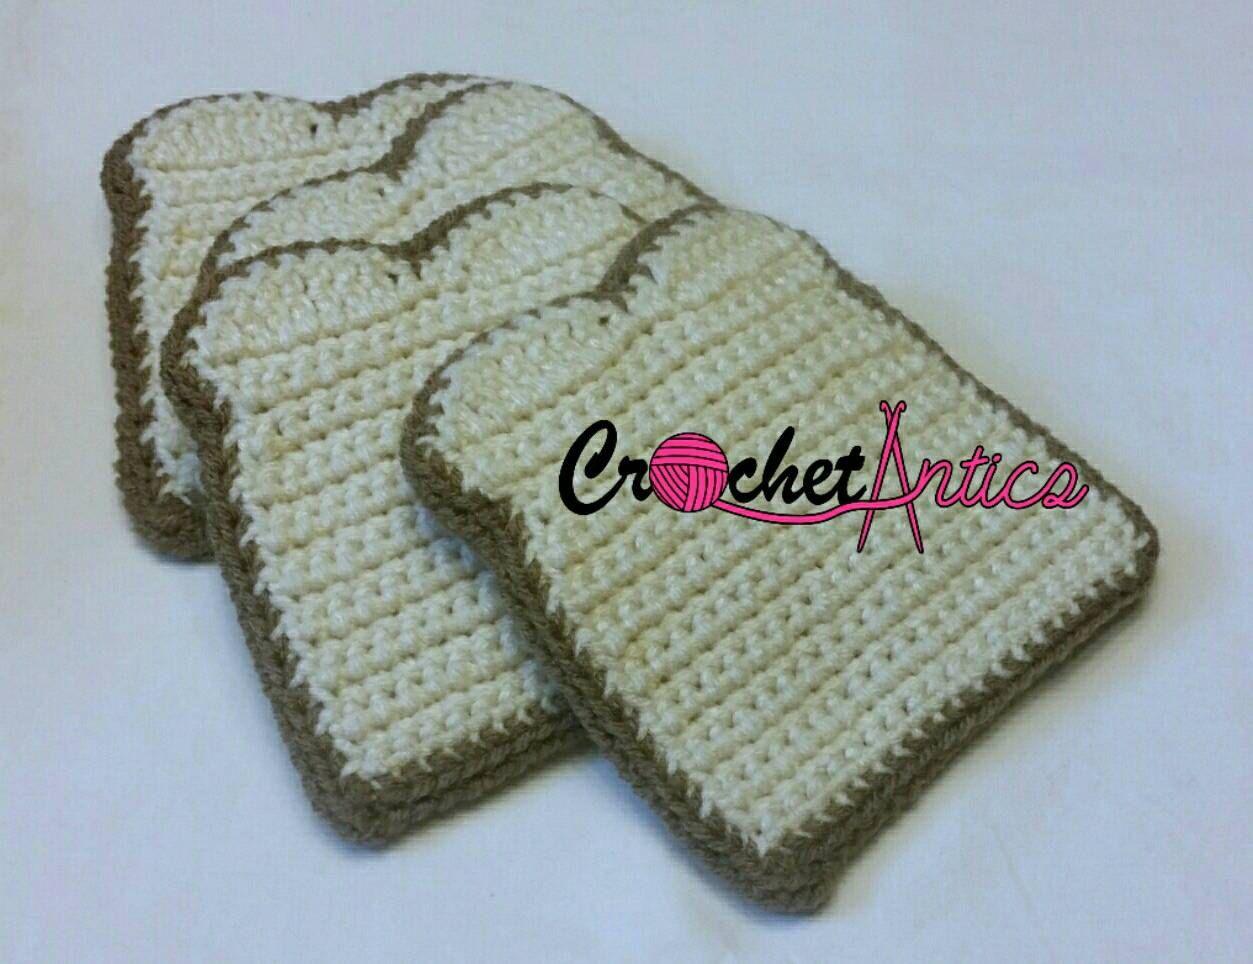 Crochet bread, crochet play food, crochet bread slices, crochet white bread, pretend food, free shipping - pinned by pin4etsy.com